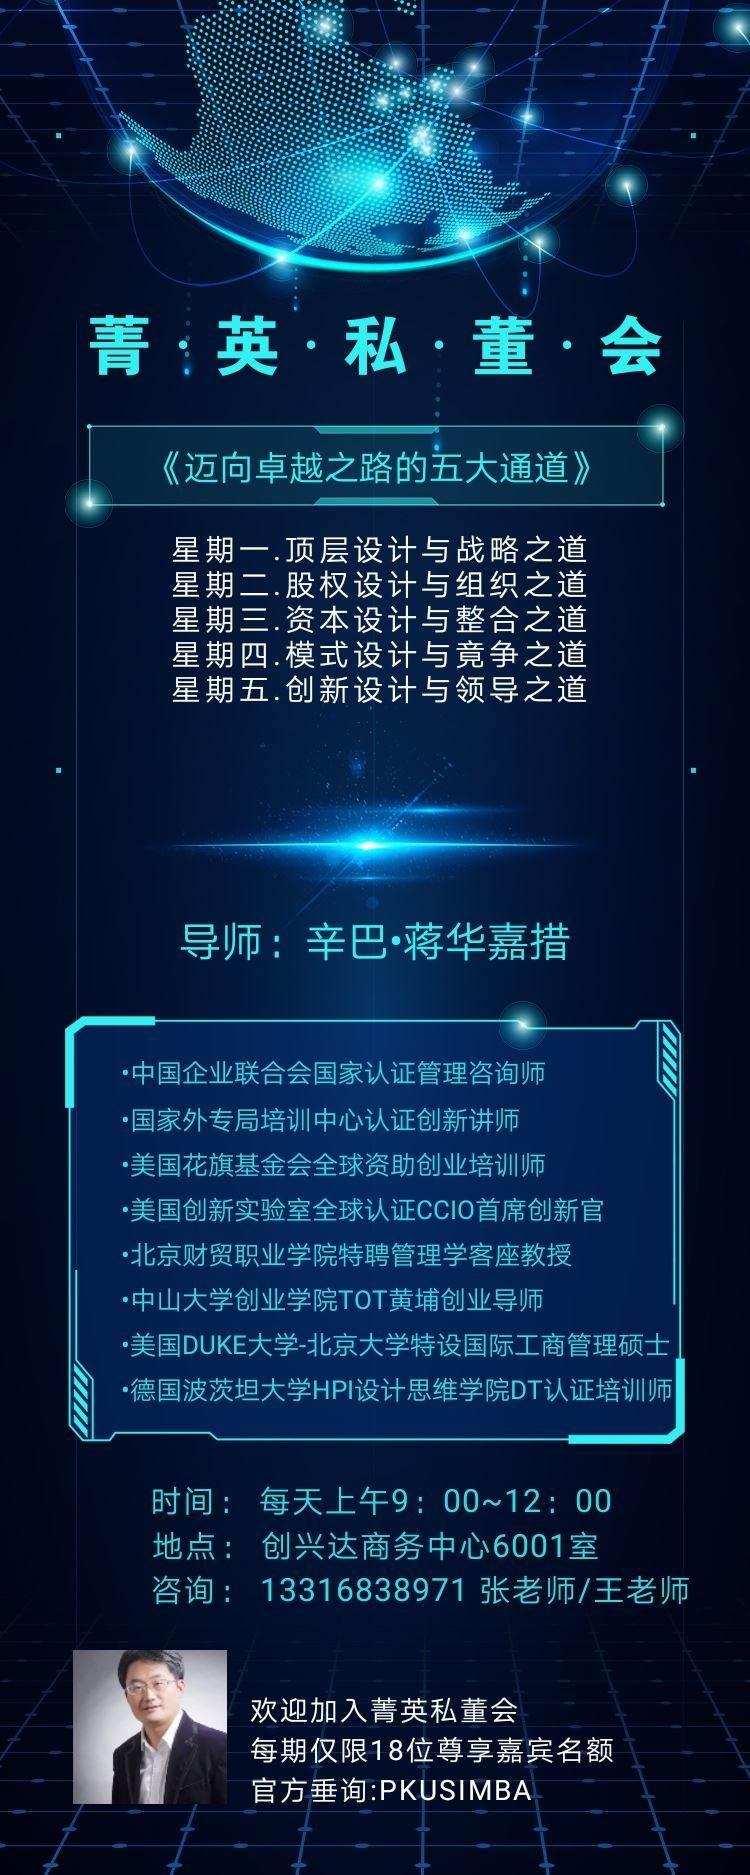 http://www.huodongxing.com/file/20141126/7551790302659/563636403561219.jpg